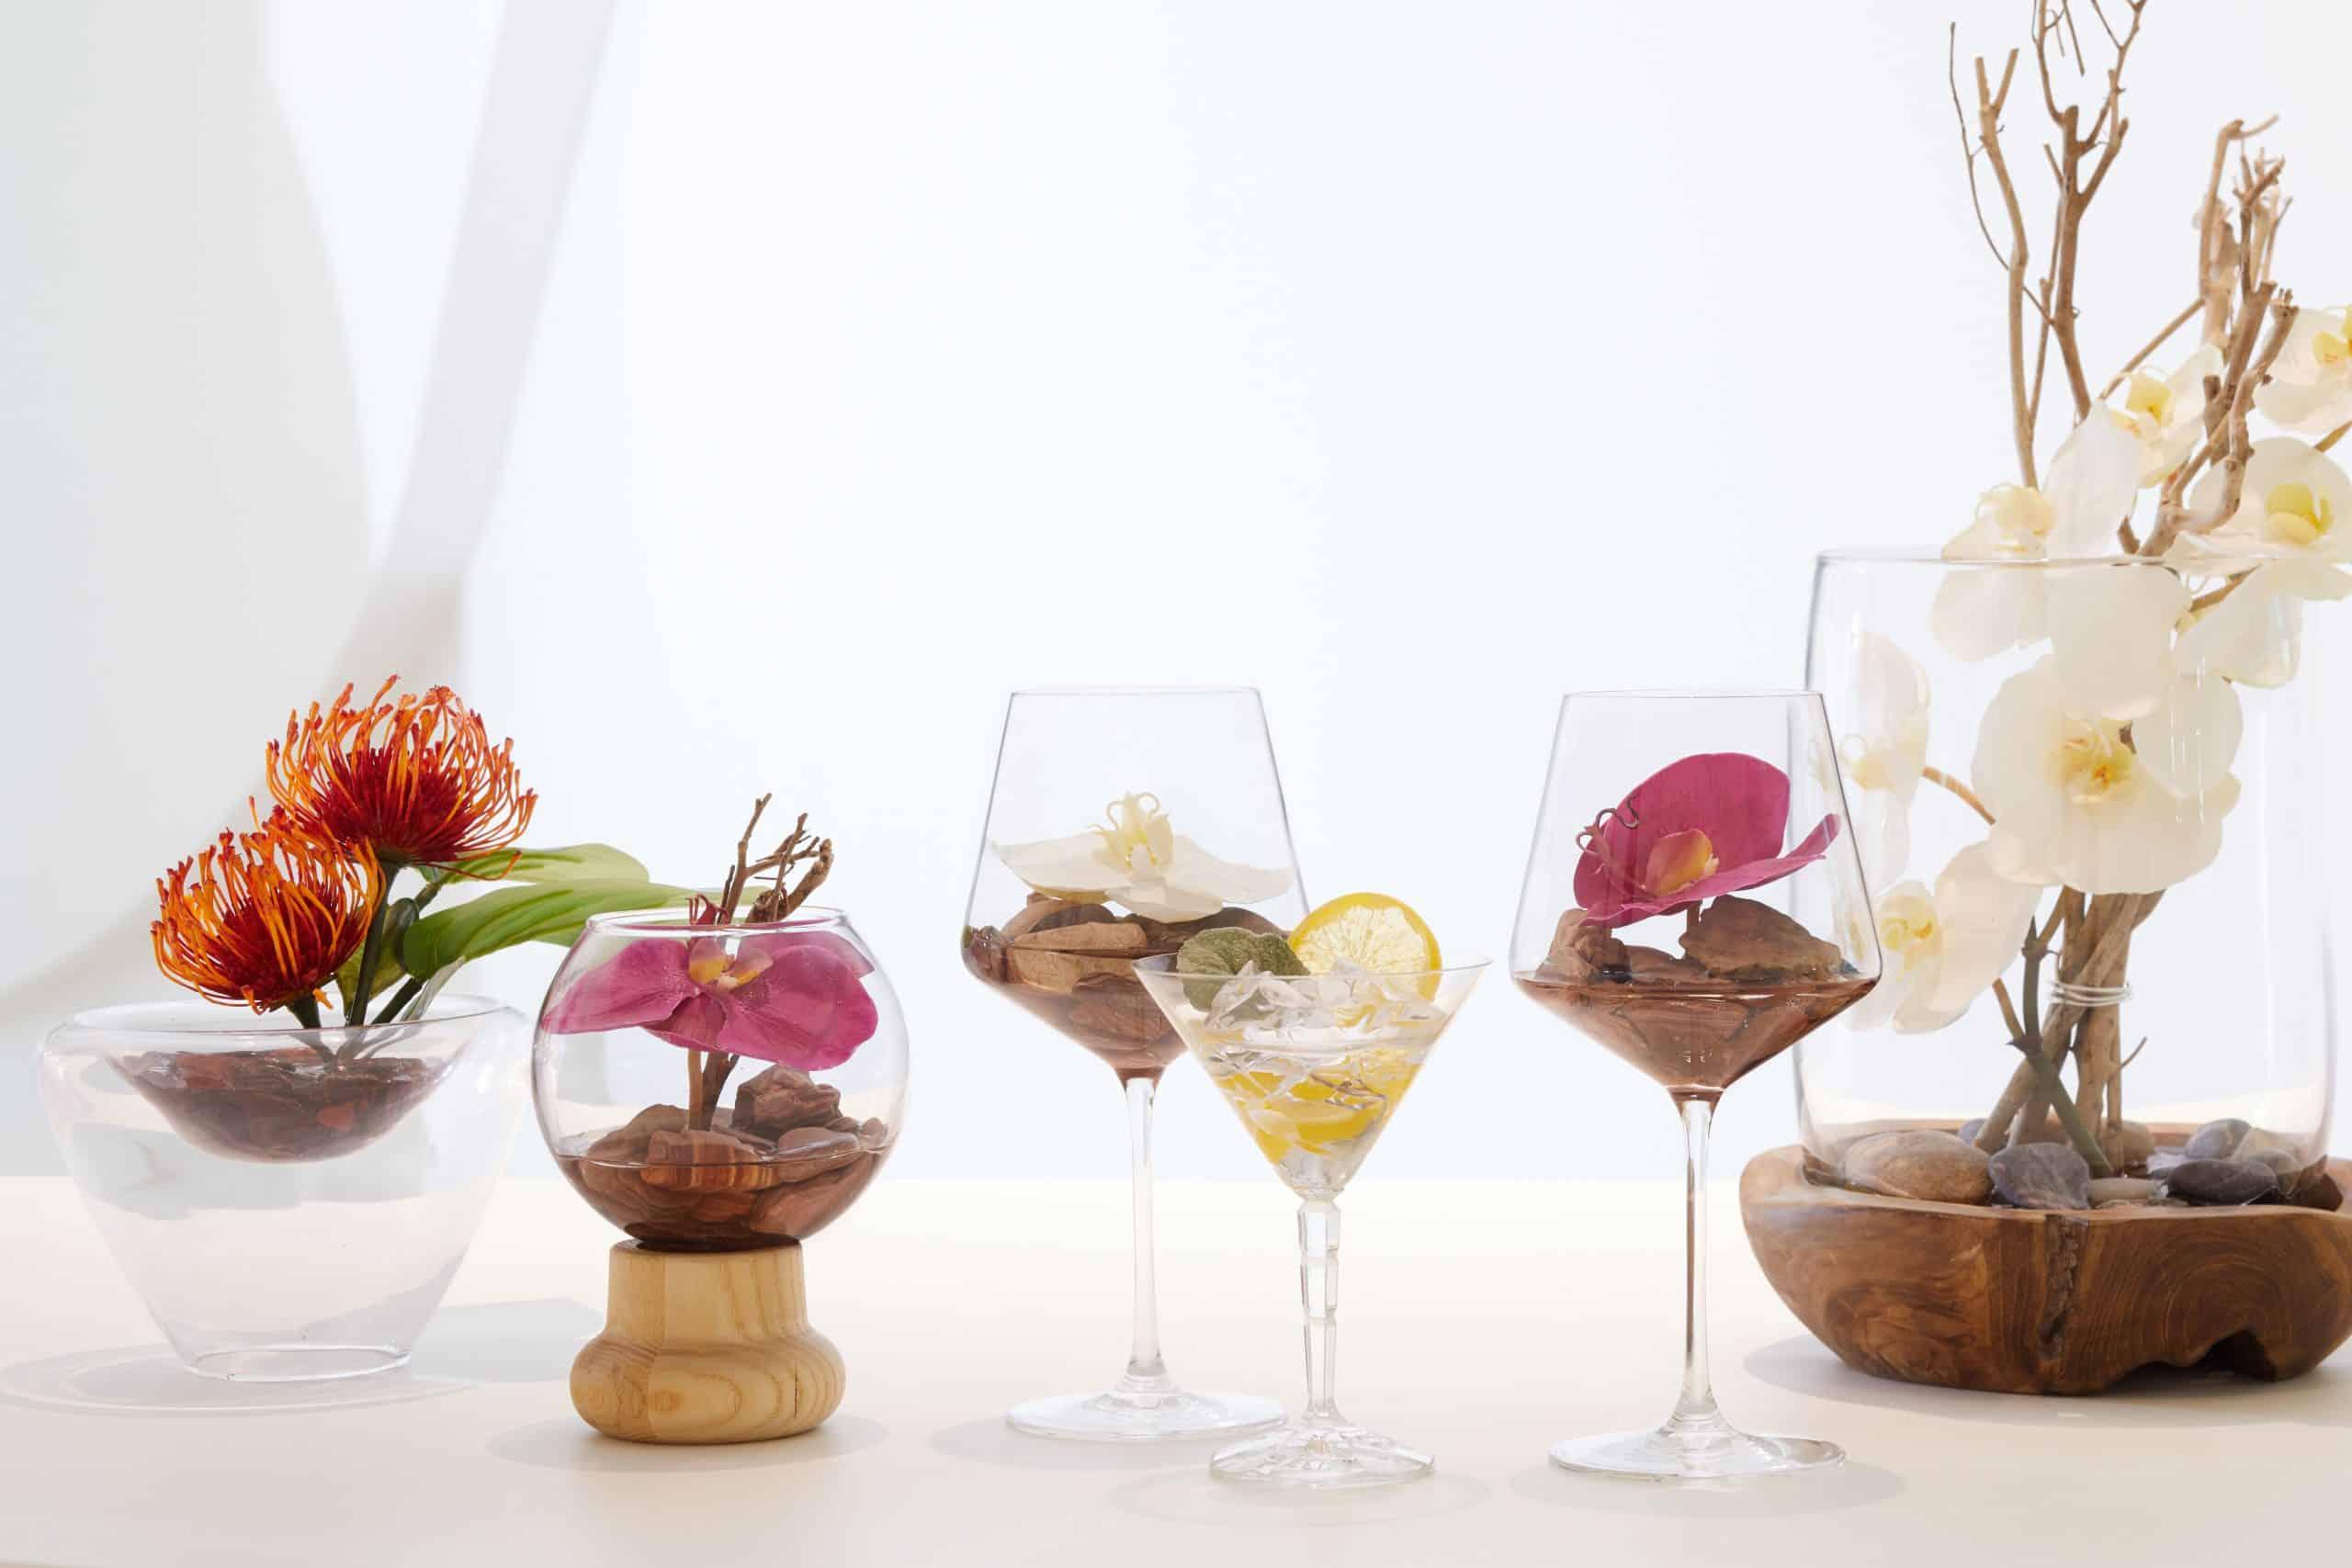 leonardo bringt florido deko konzepte foodservice. Black Bedroom Furniture Sets. Home Design Ideas